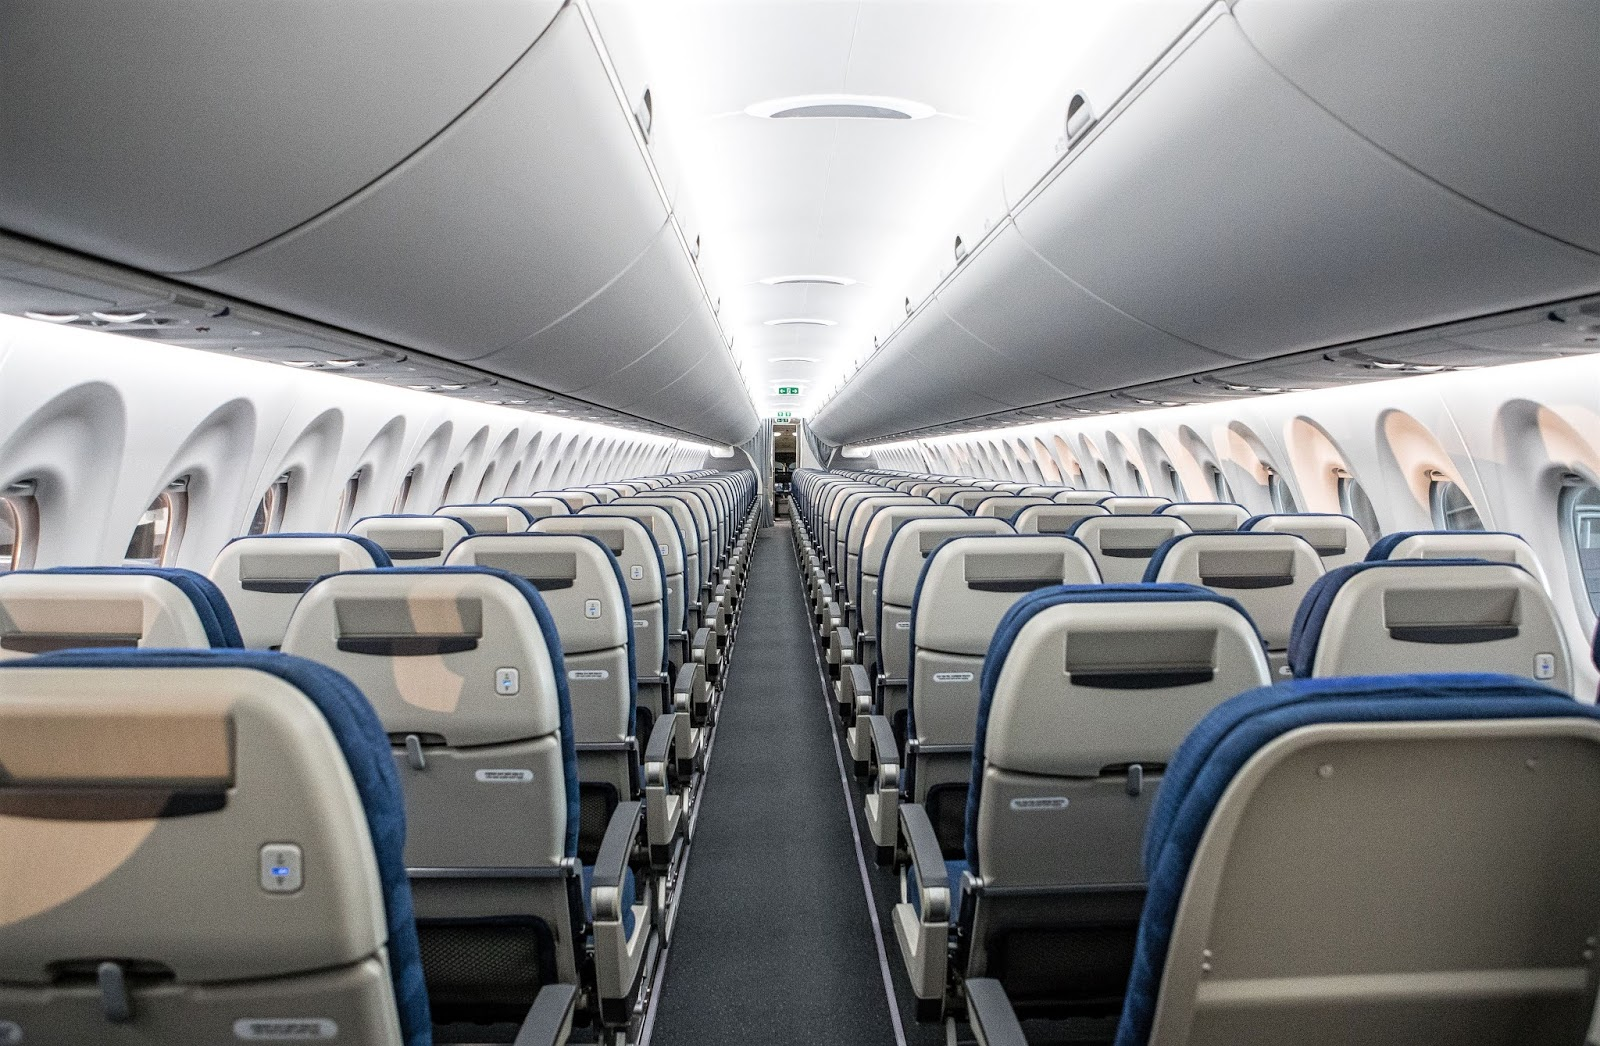 Bombardier Cs300 Korean Air Cabin Interior View Aeronef Net